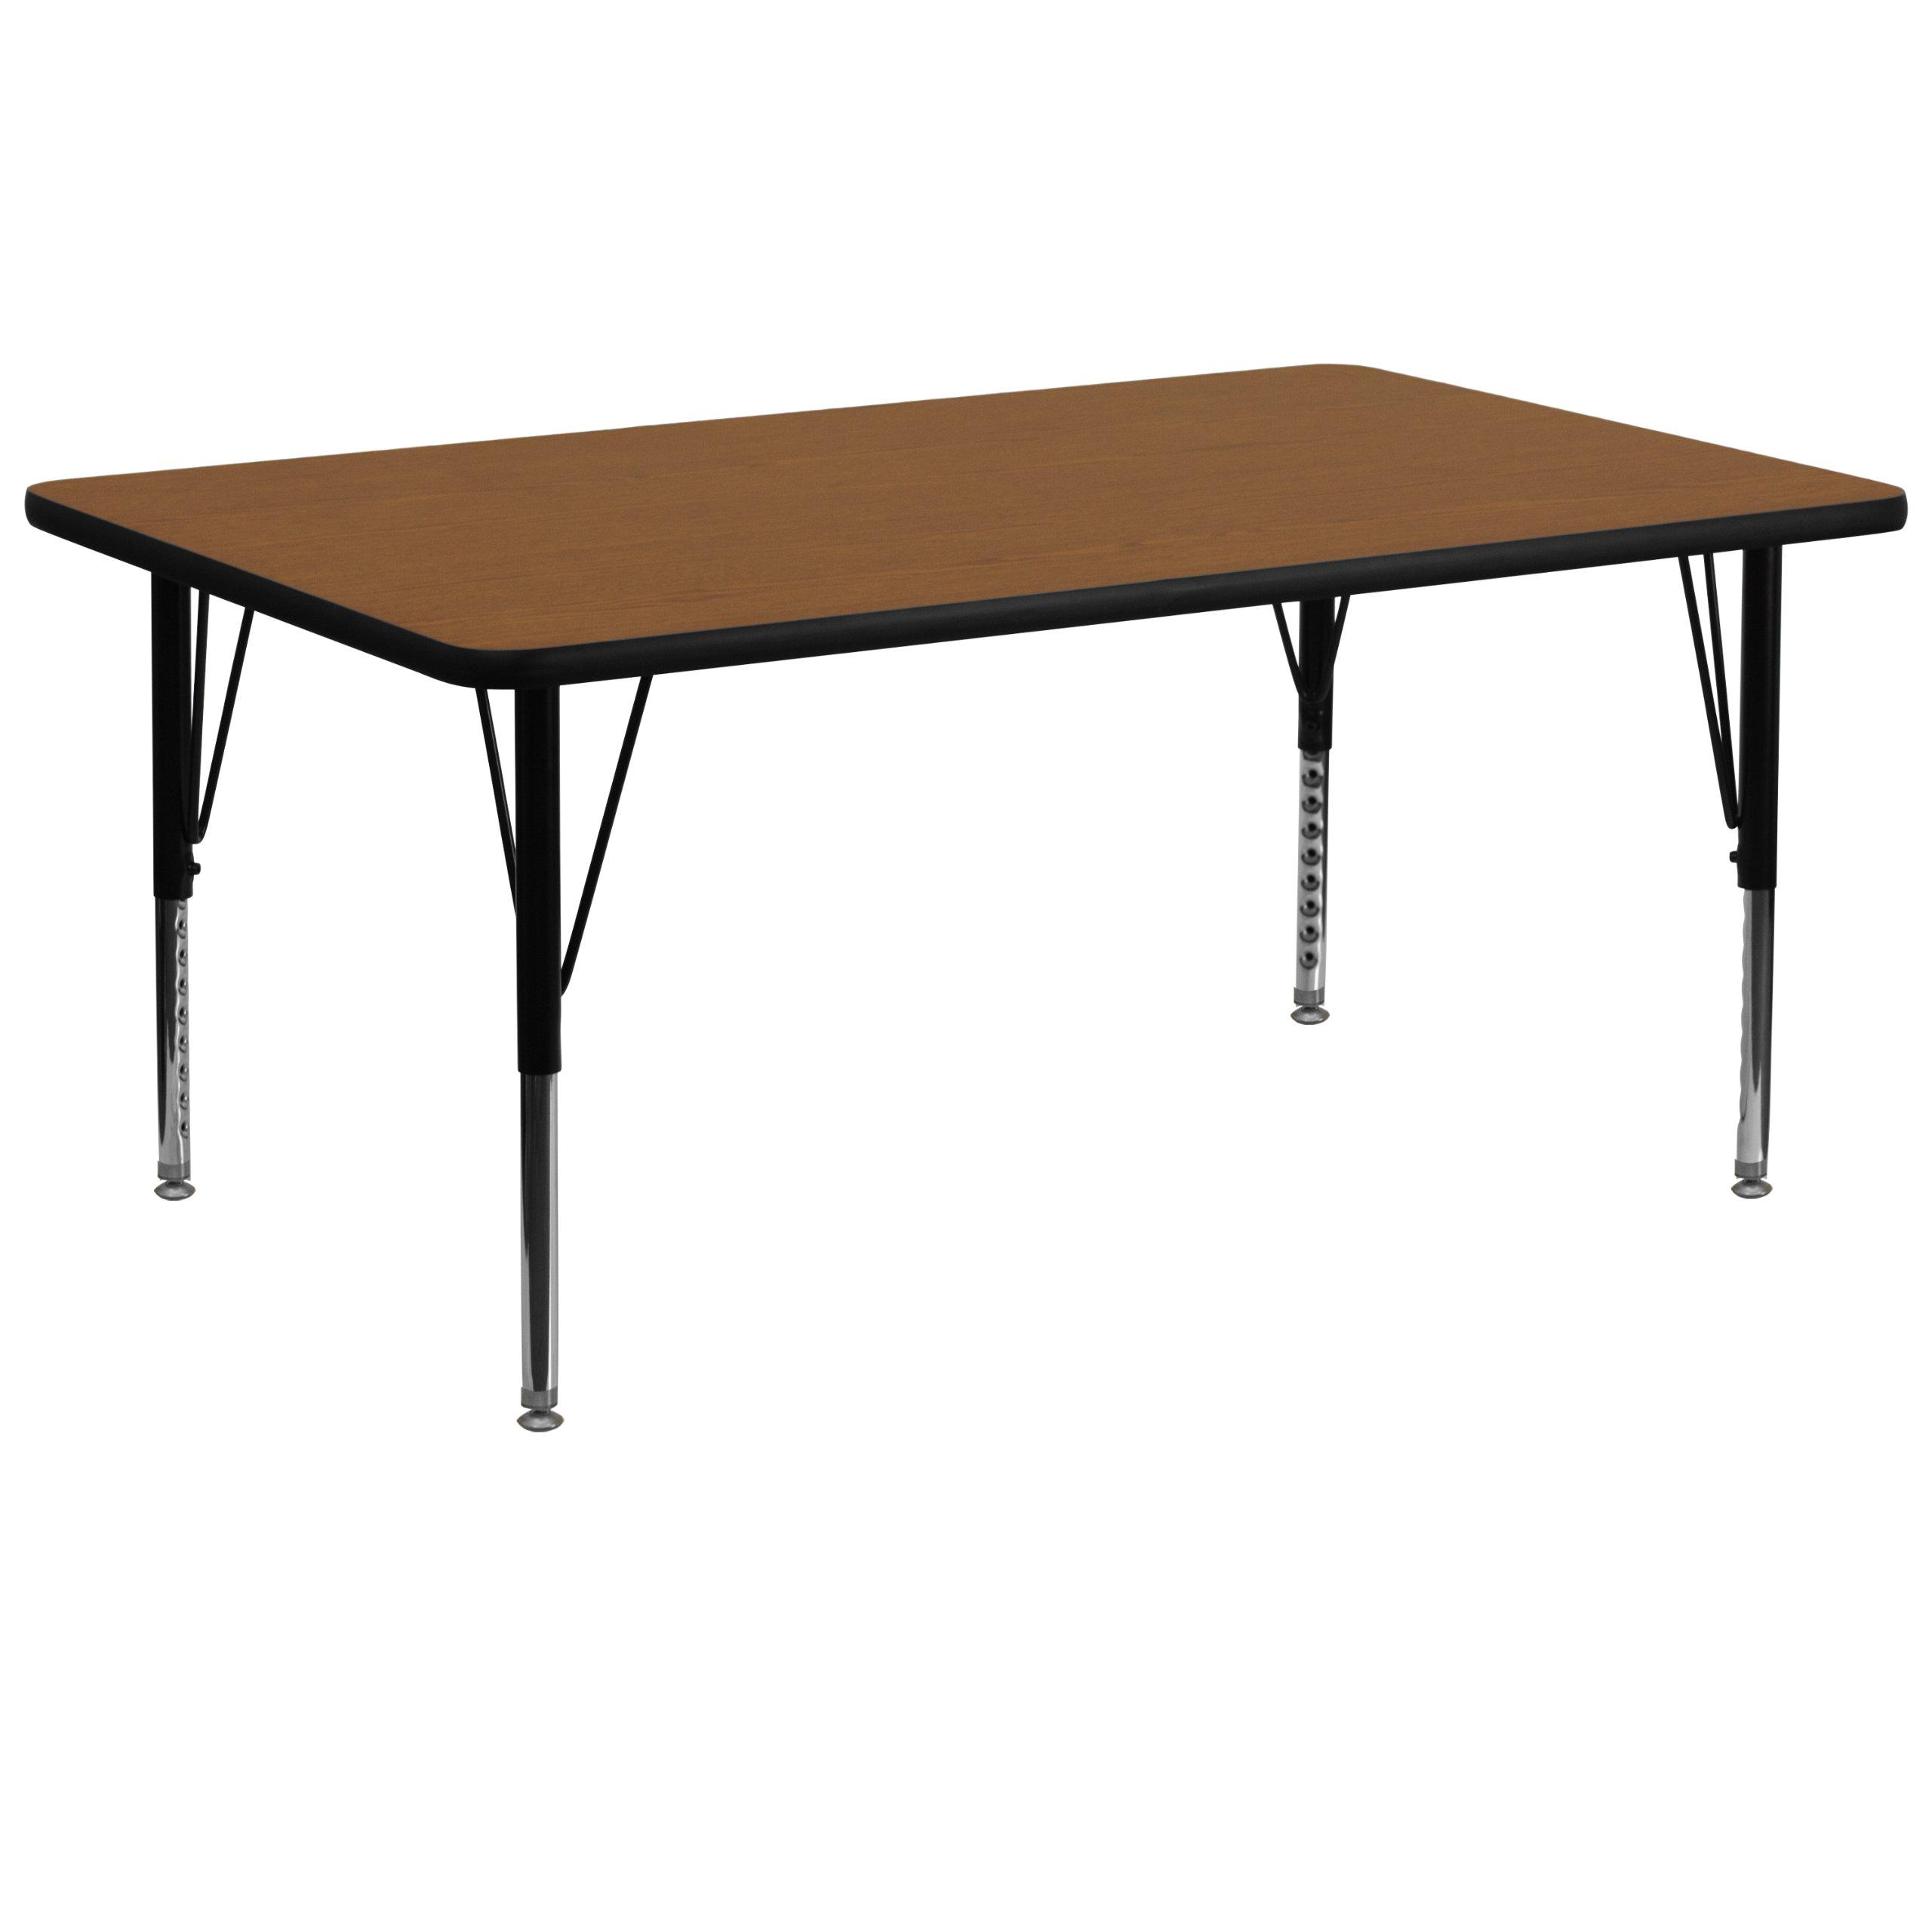 Flash Furniture 30''W x 72''L Rectangular Oak HP Laminate Activity Table - Height Adjustable Short Legs